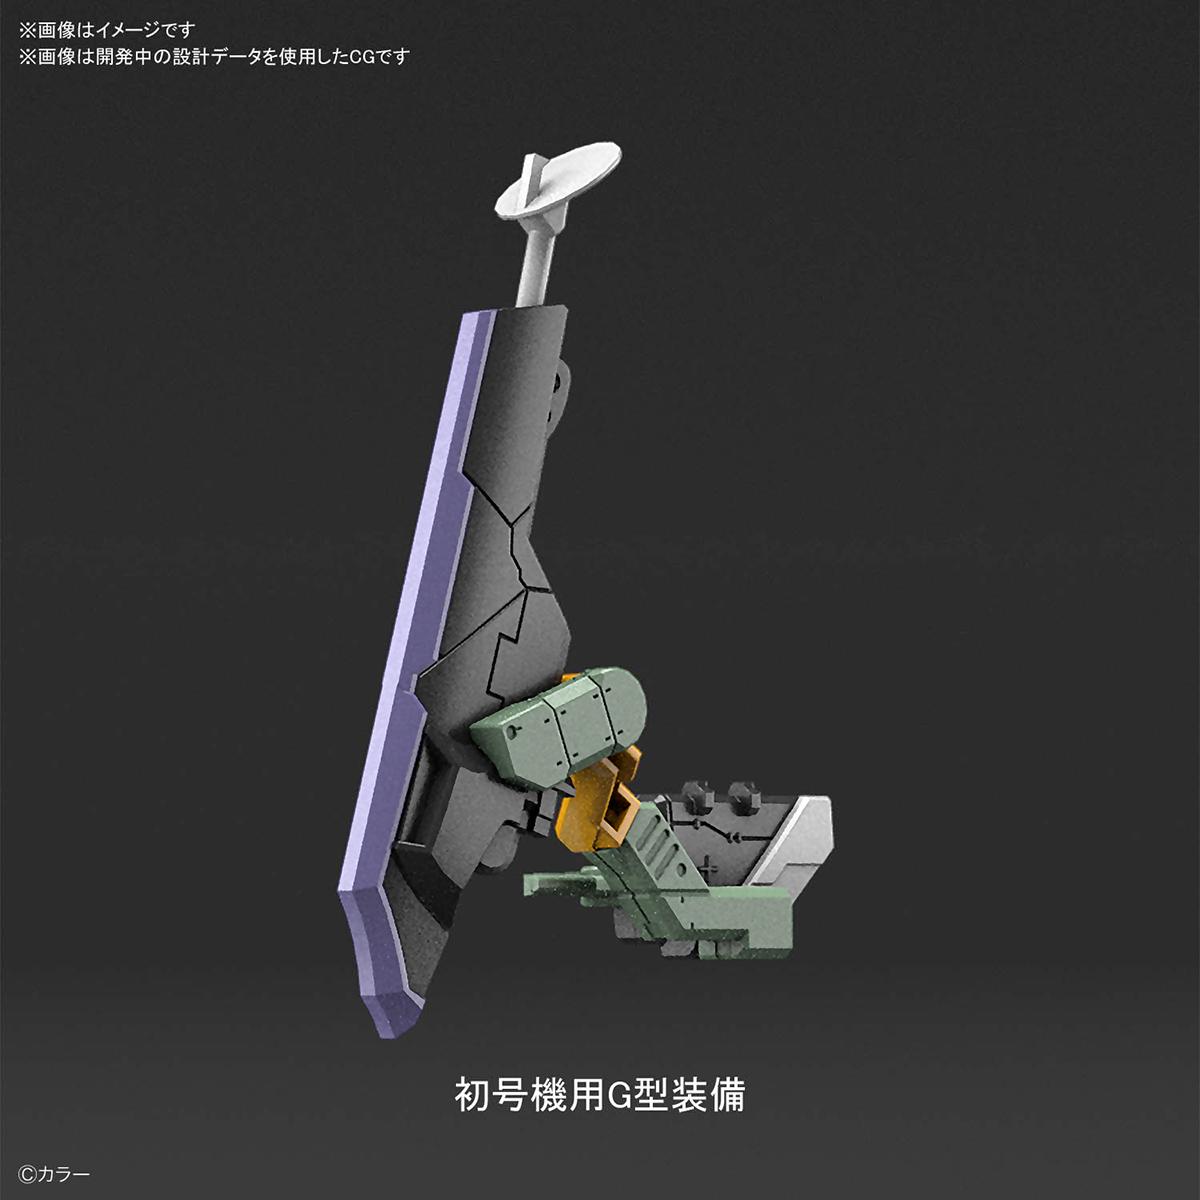 RG『汎用ヒト型決戦兵器 人造人間エヴァンゲリオン試作零号機』プラモデル-007